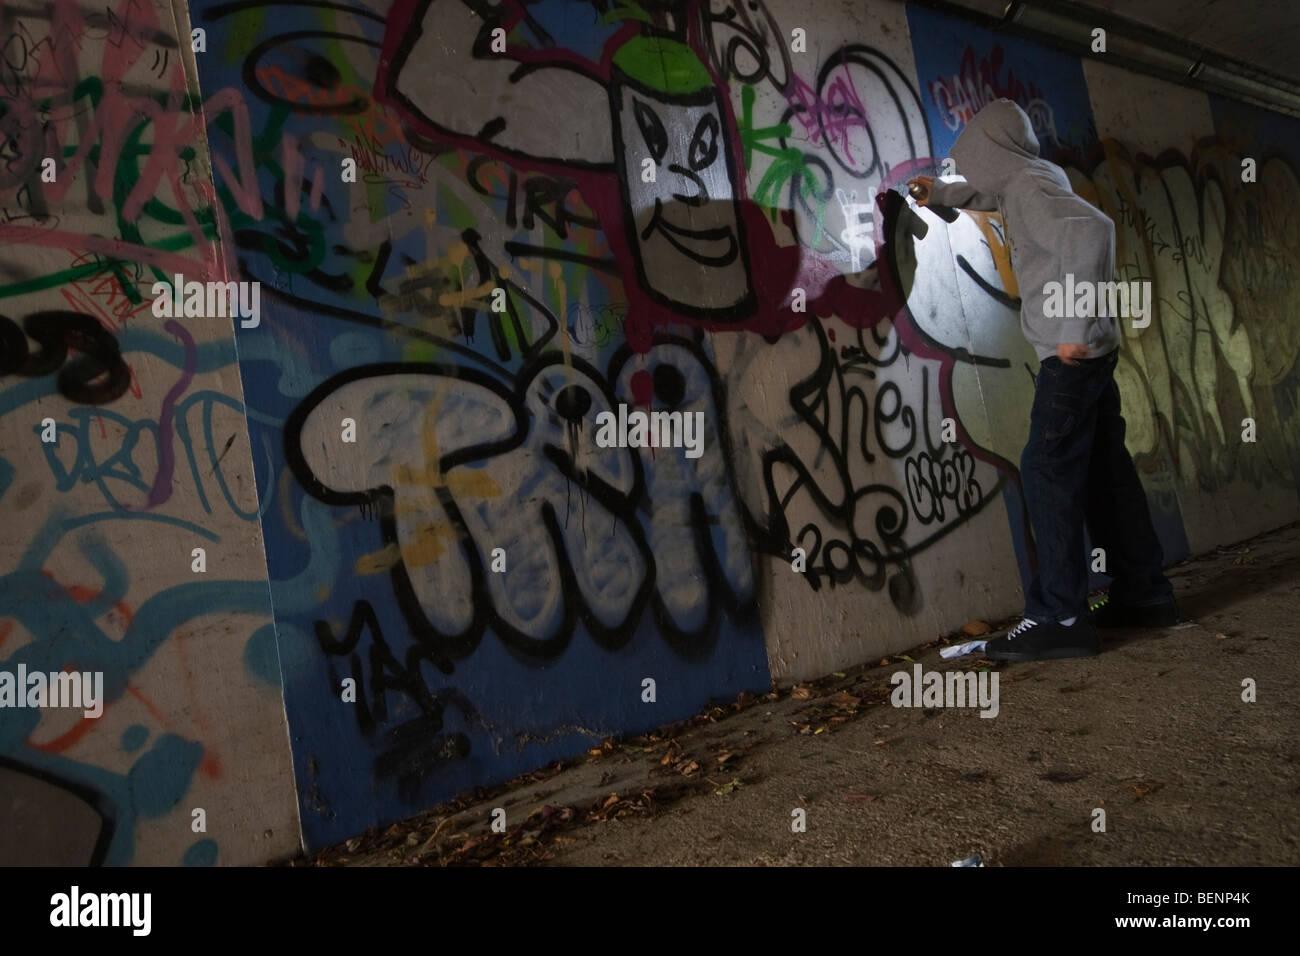 Graffiti wall chelmsford - A Teenage Boy Spraying Graffiti On A Wall In An Alley Stock Image